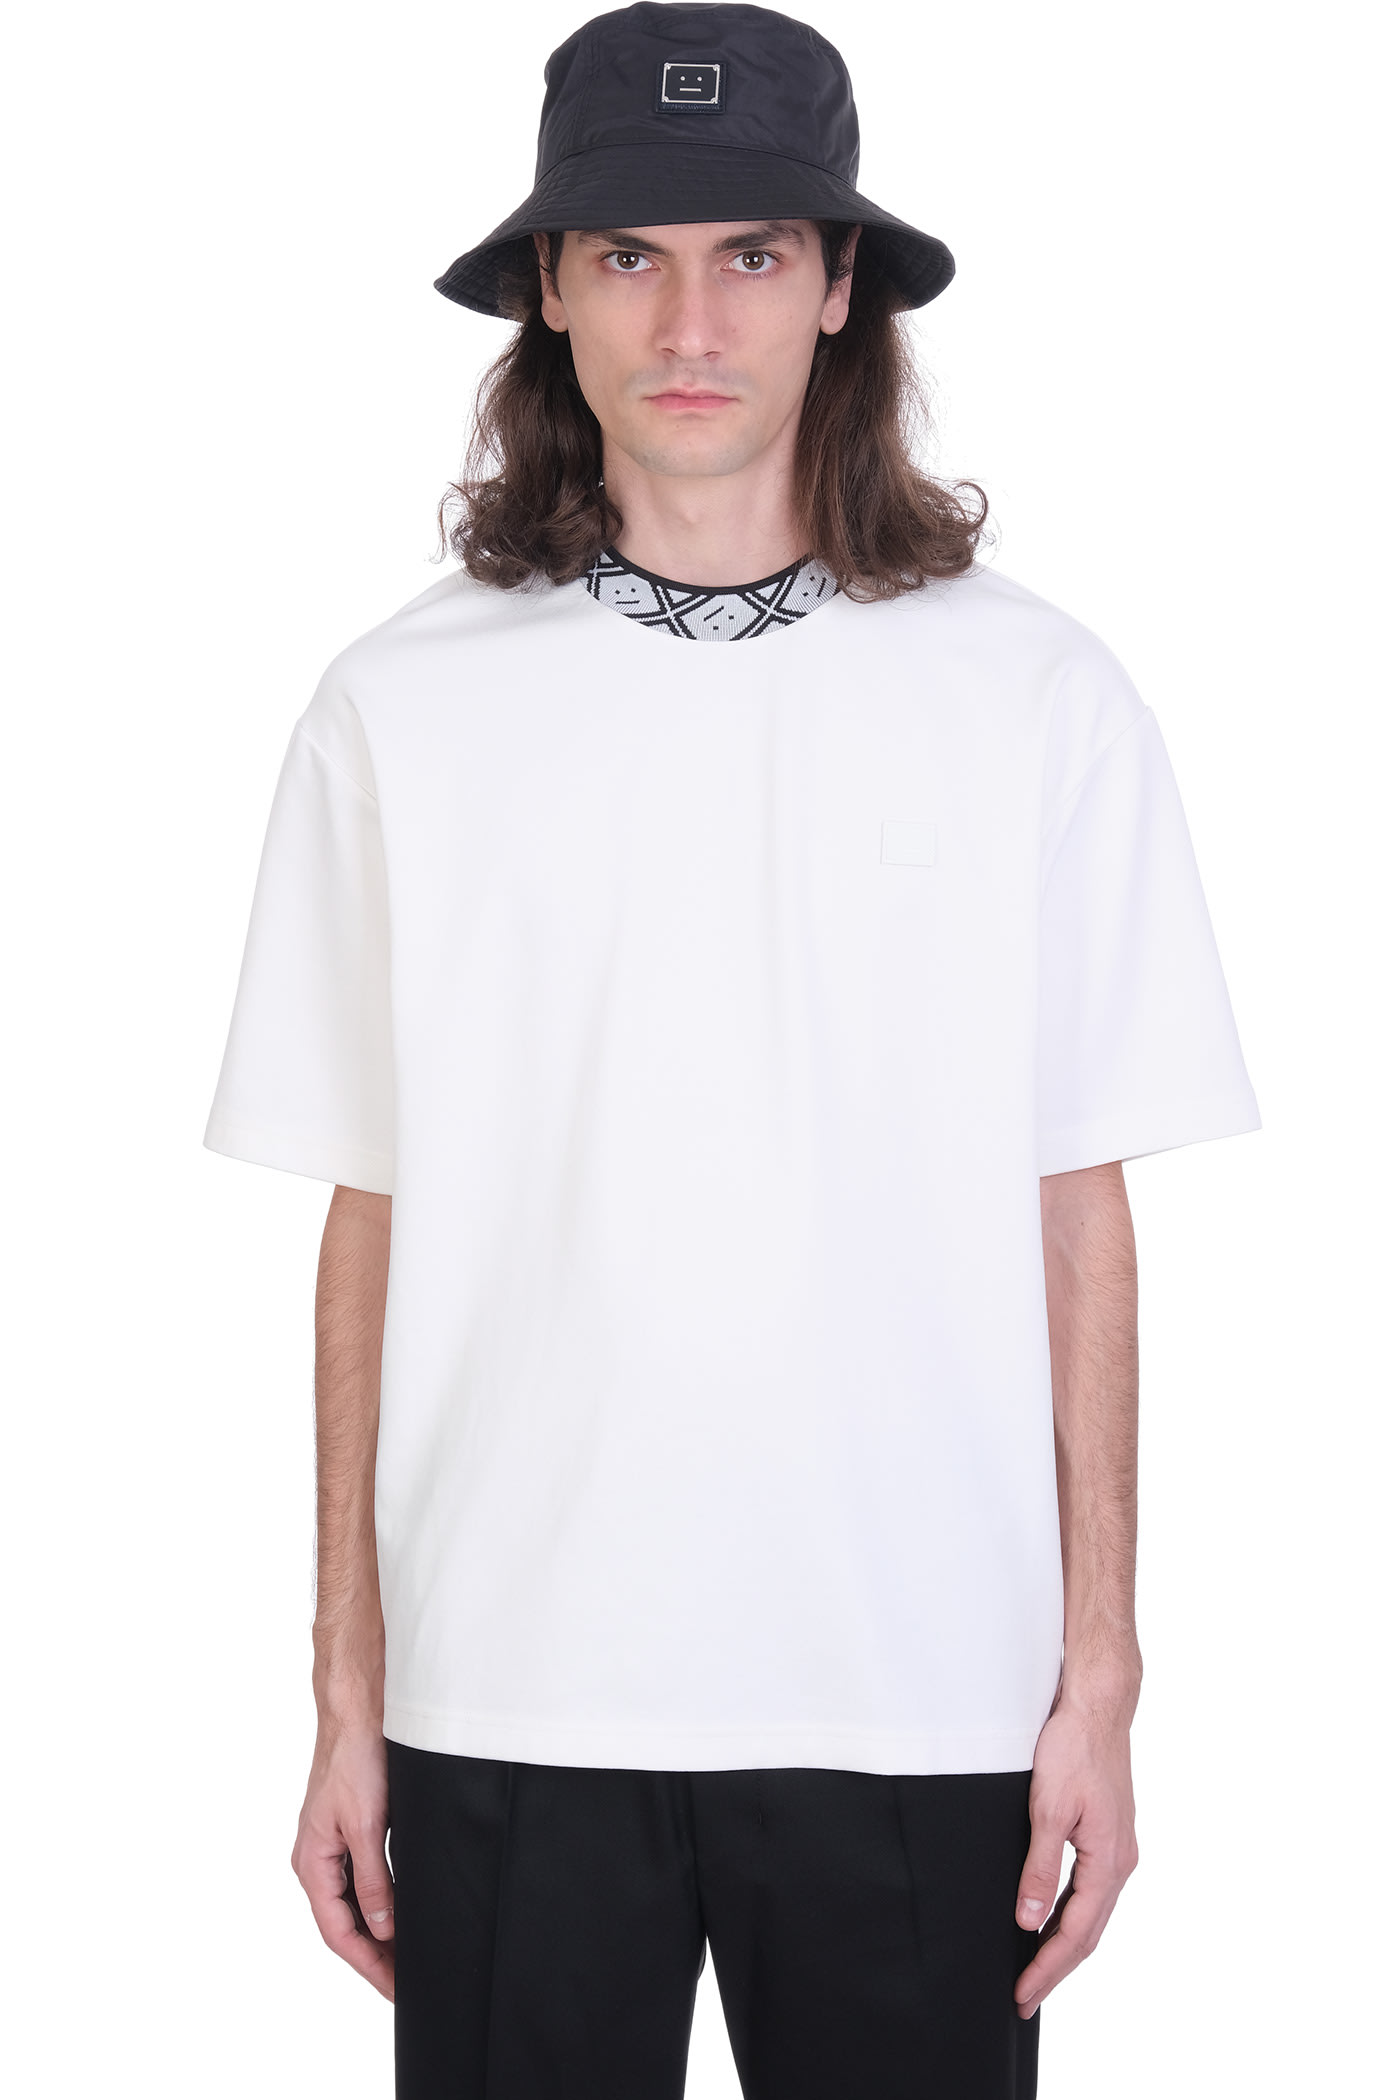 Acne Studios T-shirt In White Cotton